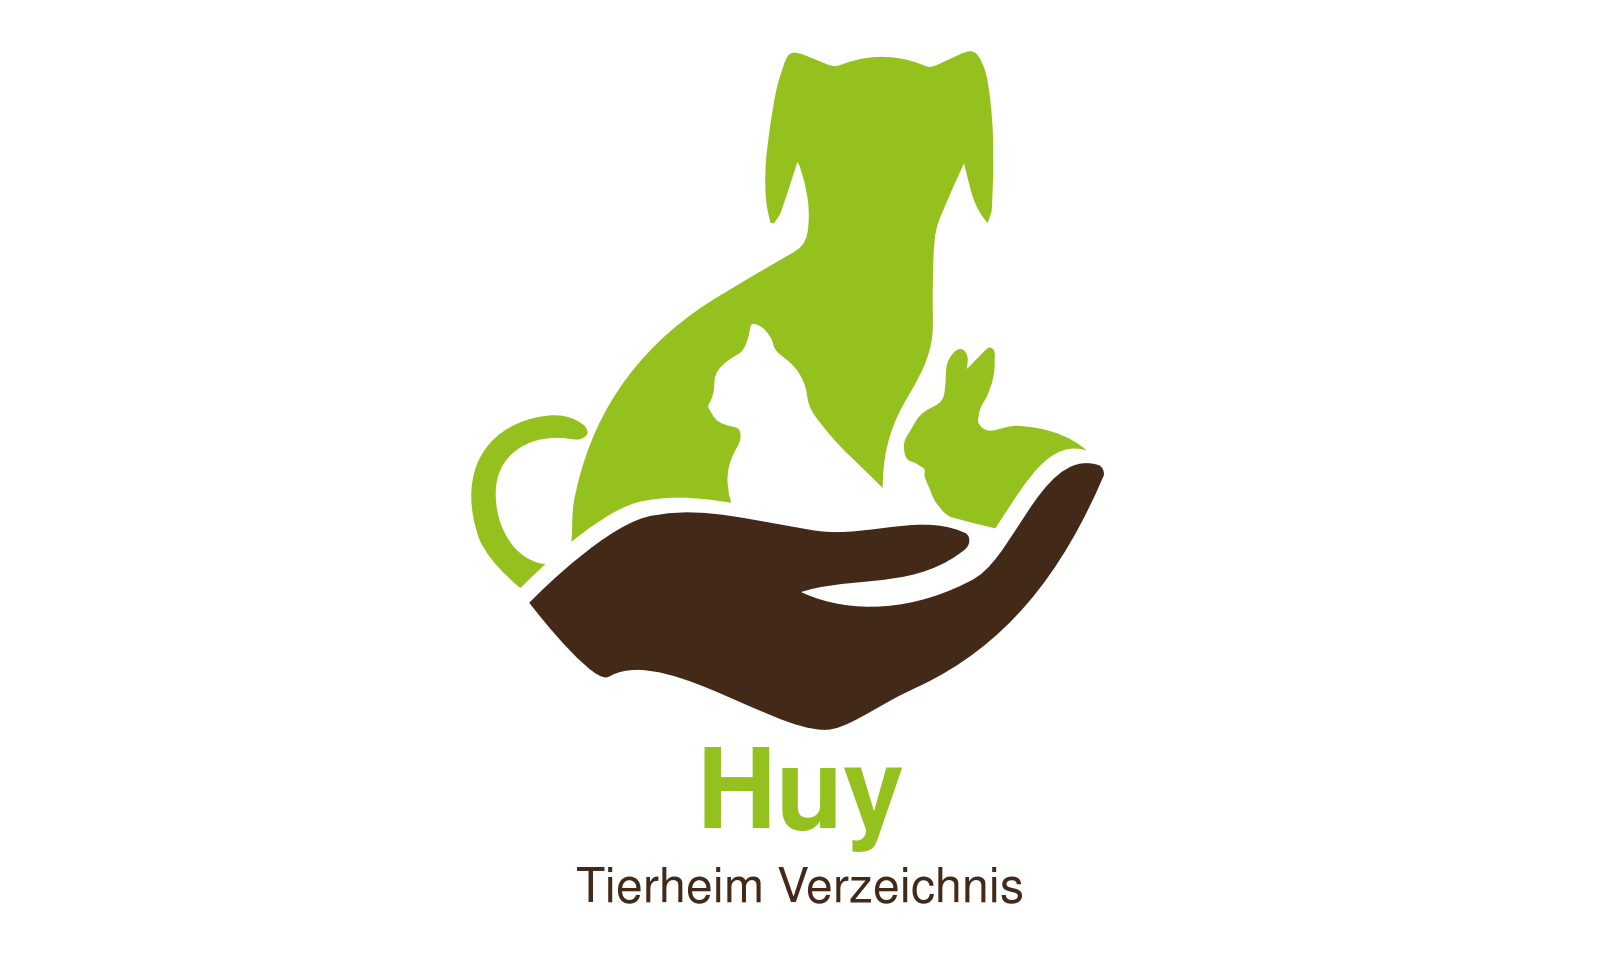 Tierheim Huy